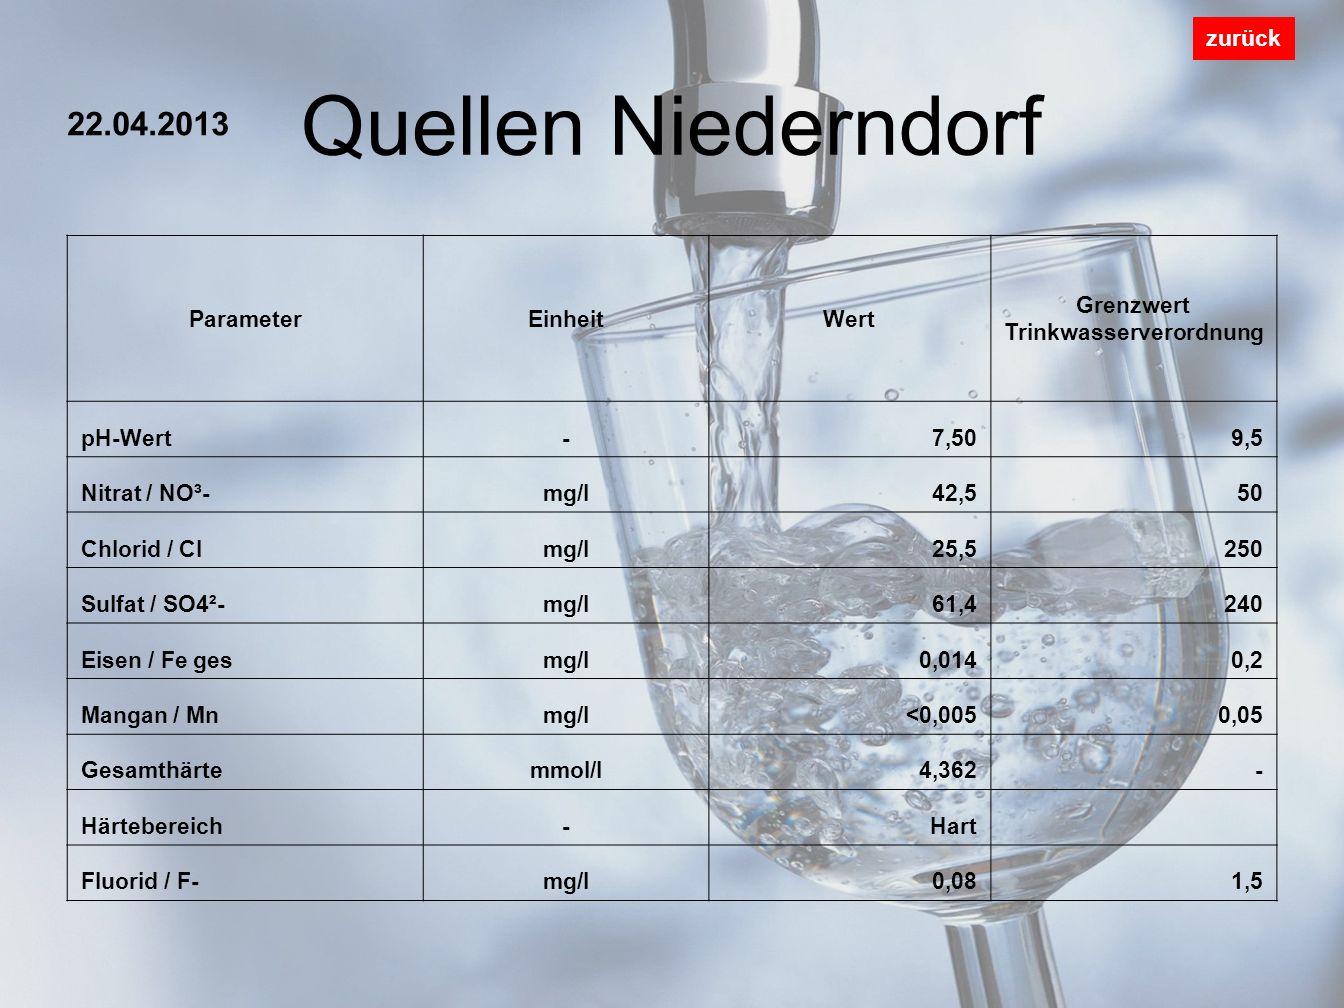 Birkhausen zurück ParameterEinheitWert Grenzwert Trinkwasserverordnung pH-Wert-7,359,5 Nitrat / NO³-mg/l< 0,250 Chlorid / Clmg/l19,6250 Sulfat / SO4²-mg/l67,7240 Eisen / Fe gesmg/l0,0120,2 Mangan / Mnmg/l<0,0050,05 Gesamthärtemmol/l3,273- Härtebereich-Hart Fluorid / F-mg/l0,211,5 22.04.2013